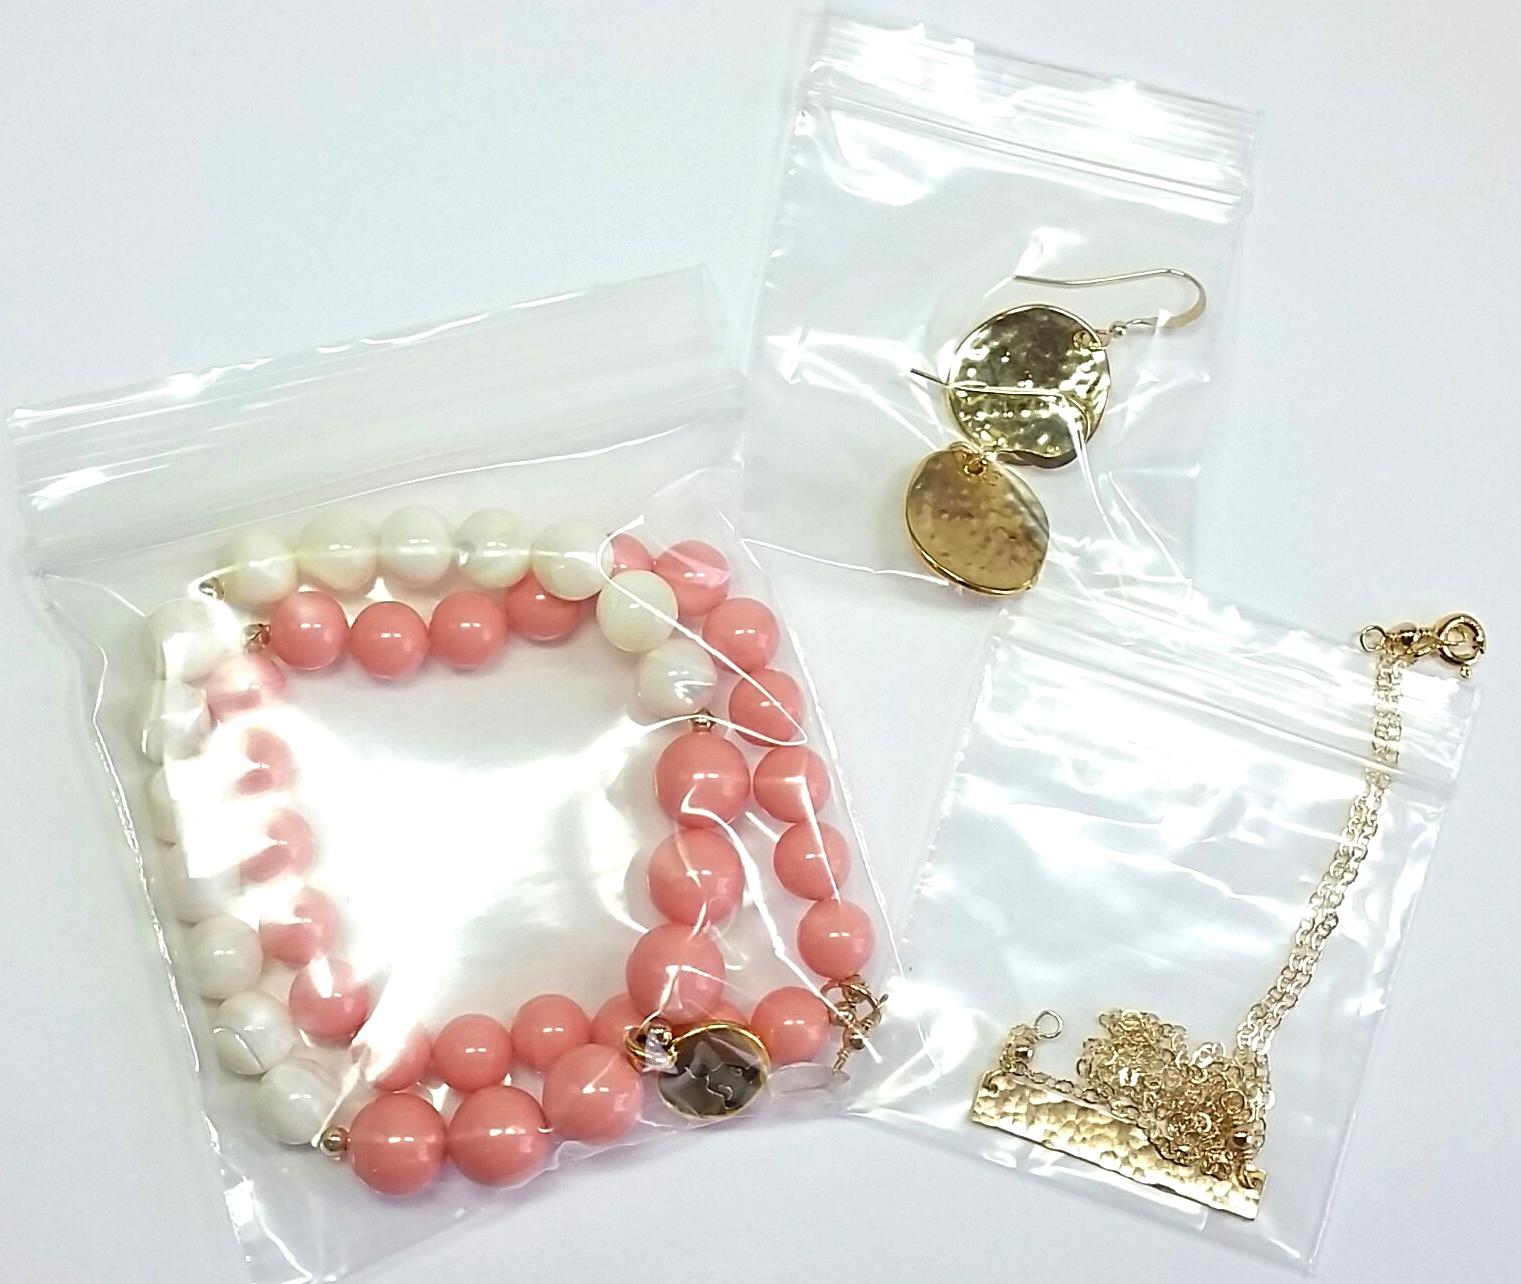 Jewelry Care - Brooklyn Designs